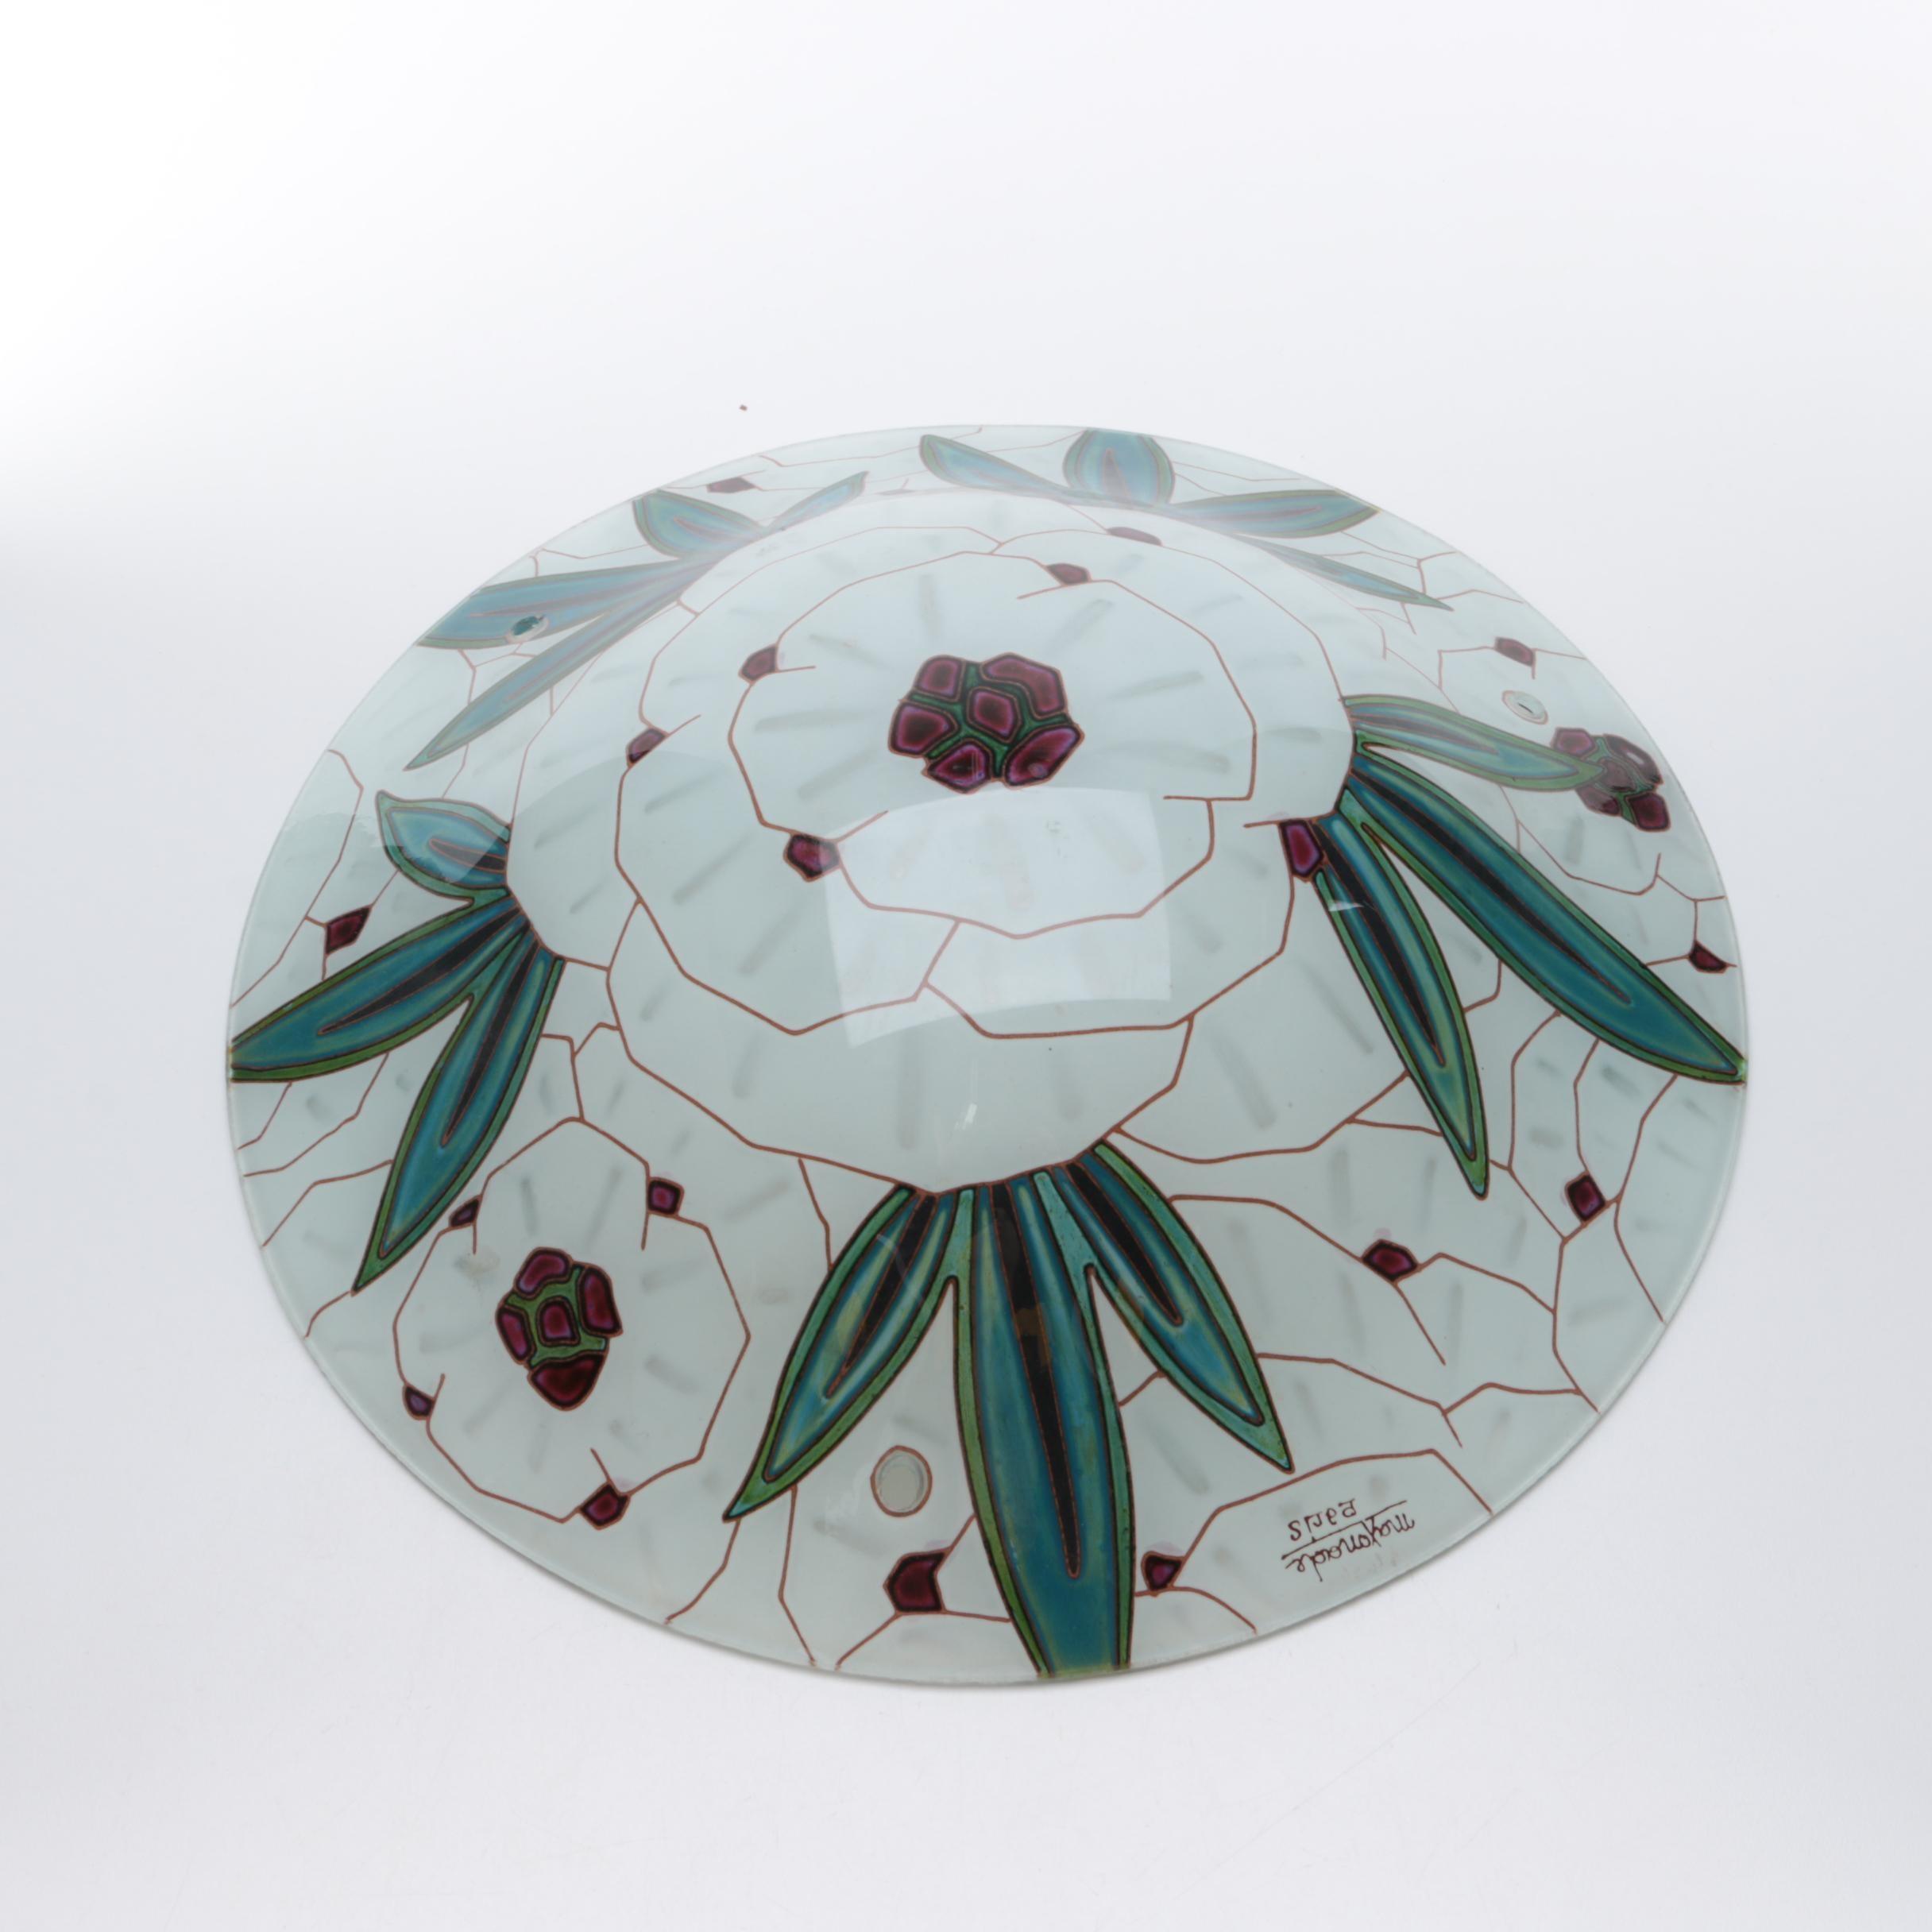 Art Deco Maxonade Art Glass Plafonnier Shade